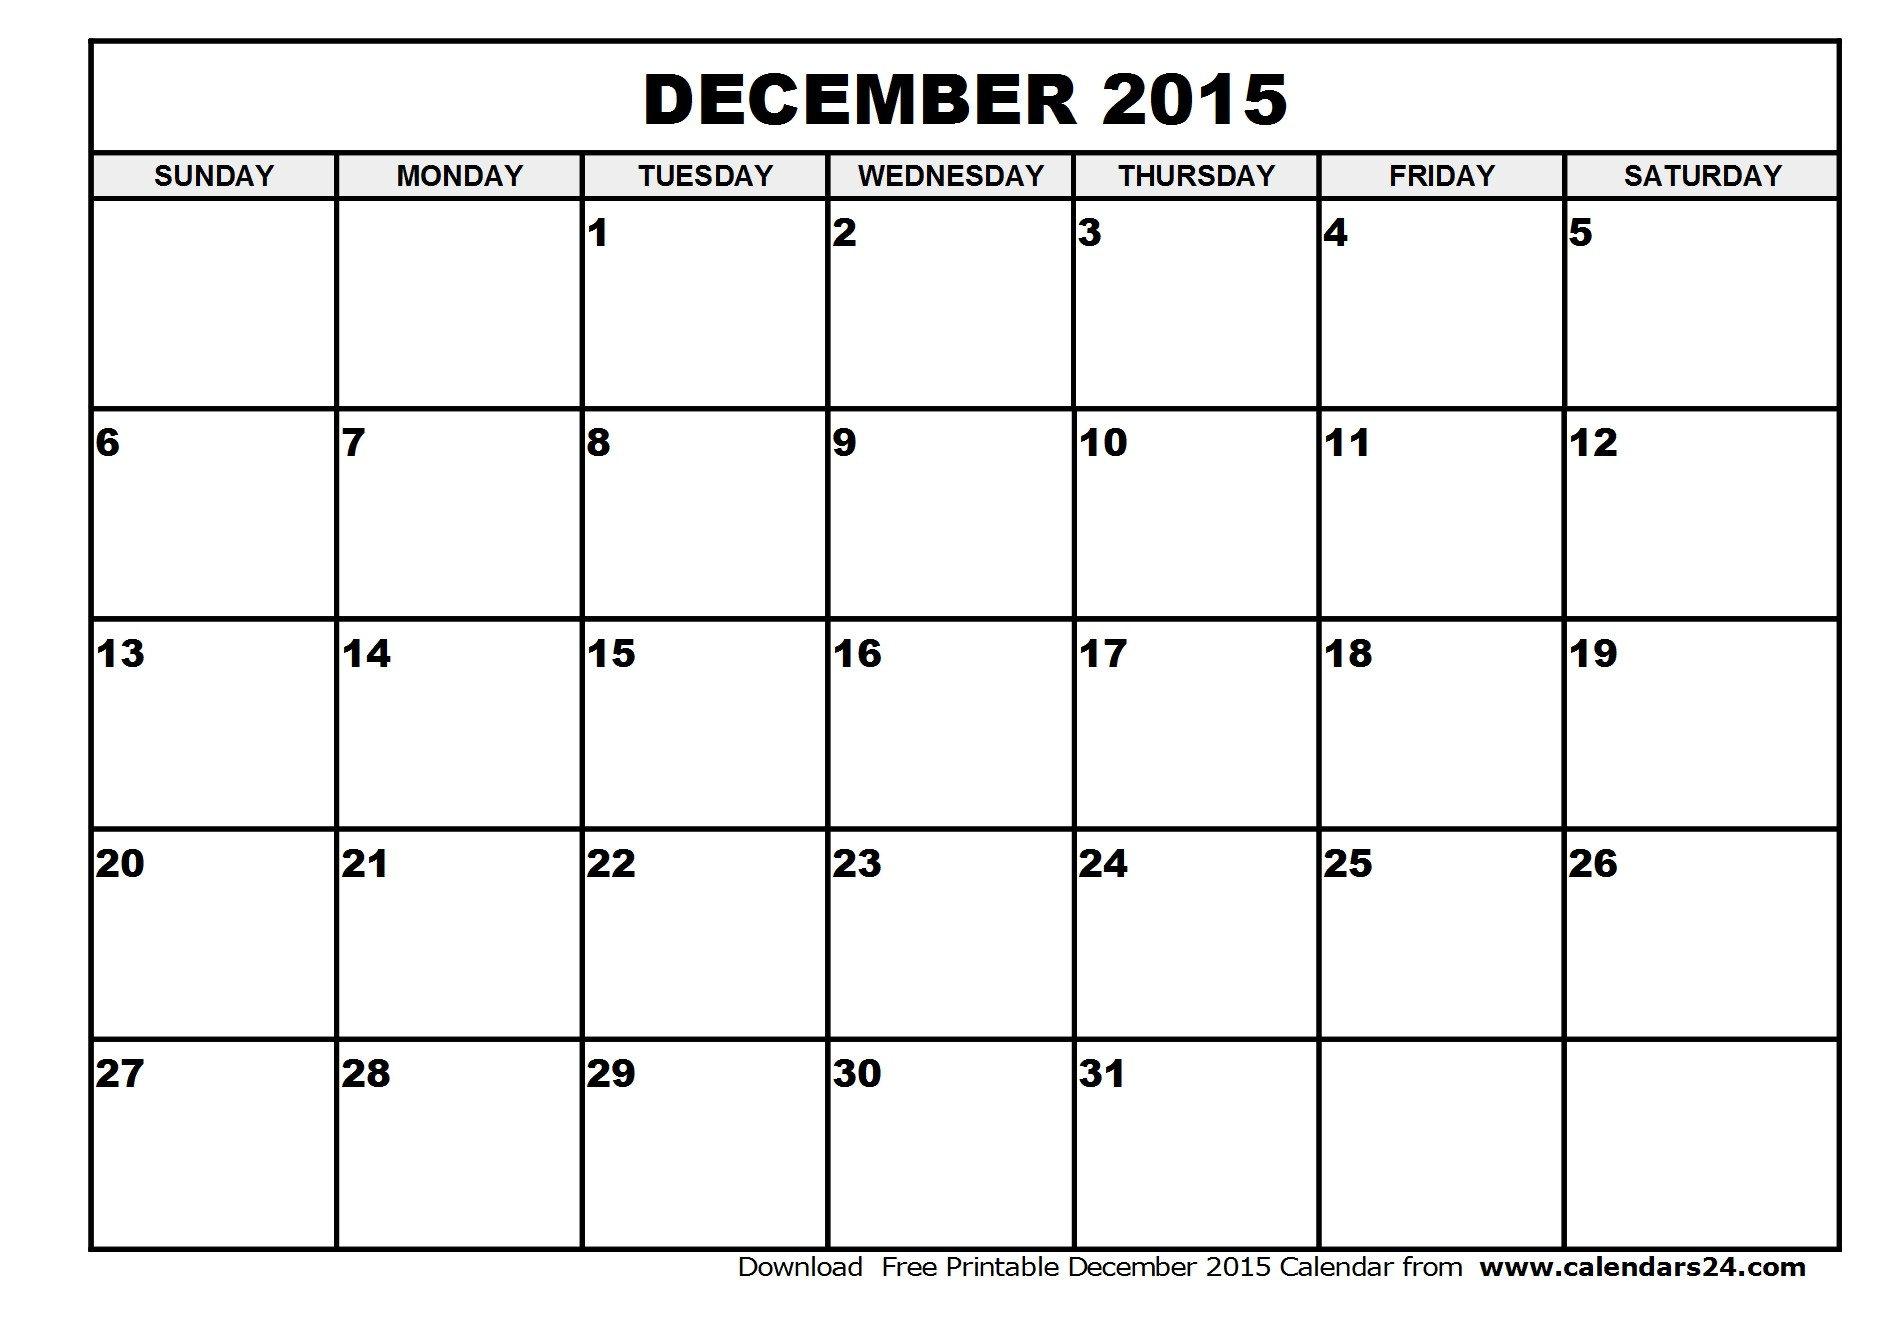 Calendario Dezembro 2017 Para Imprimir Excel Más Reciente Dentrodabiblia December 2015 Able Calendar Of Calendario Dezembro 2017 Para Imprimir Excel Actual Relat³rio De Dados Enviados Do Coleta